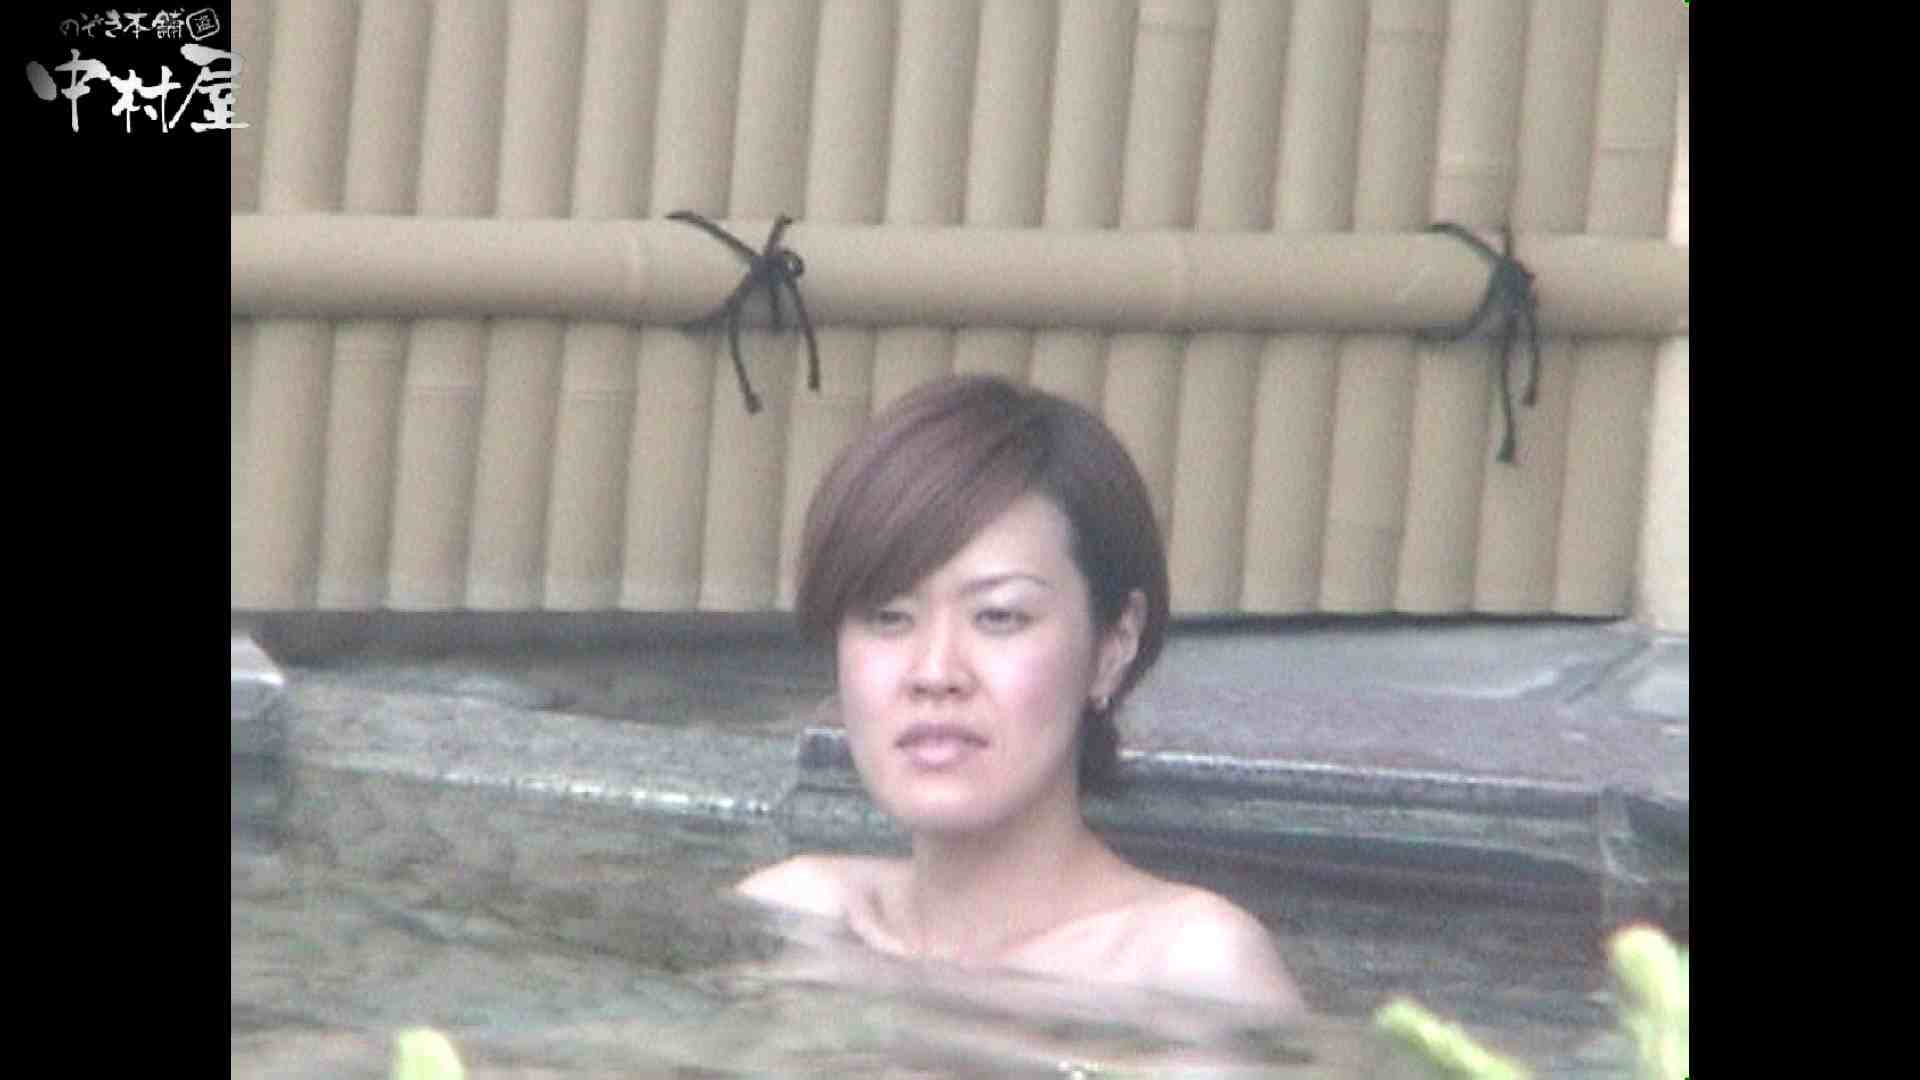 Aquaな露天風呂Vol.961 盗撮 のぞき動画画像 61枚 44